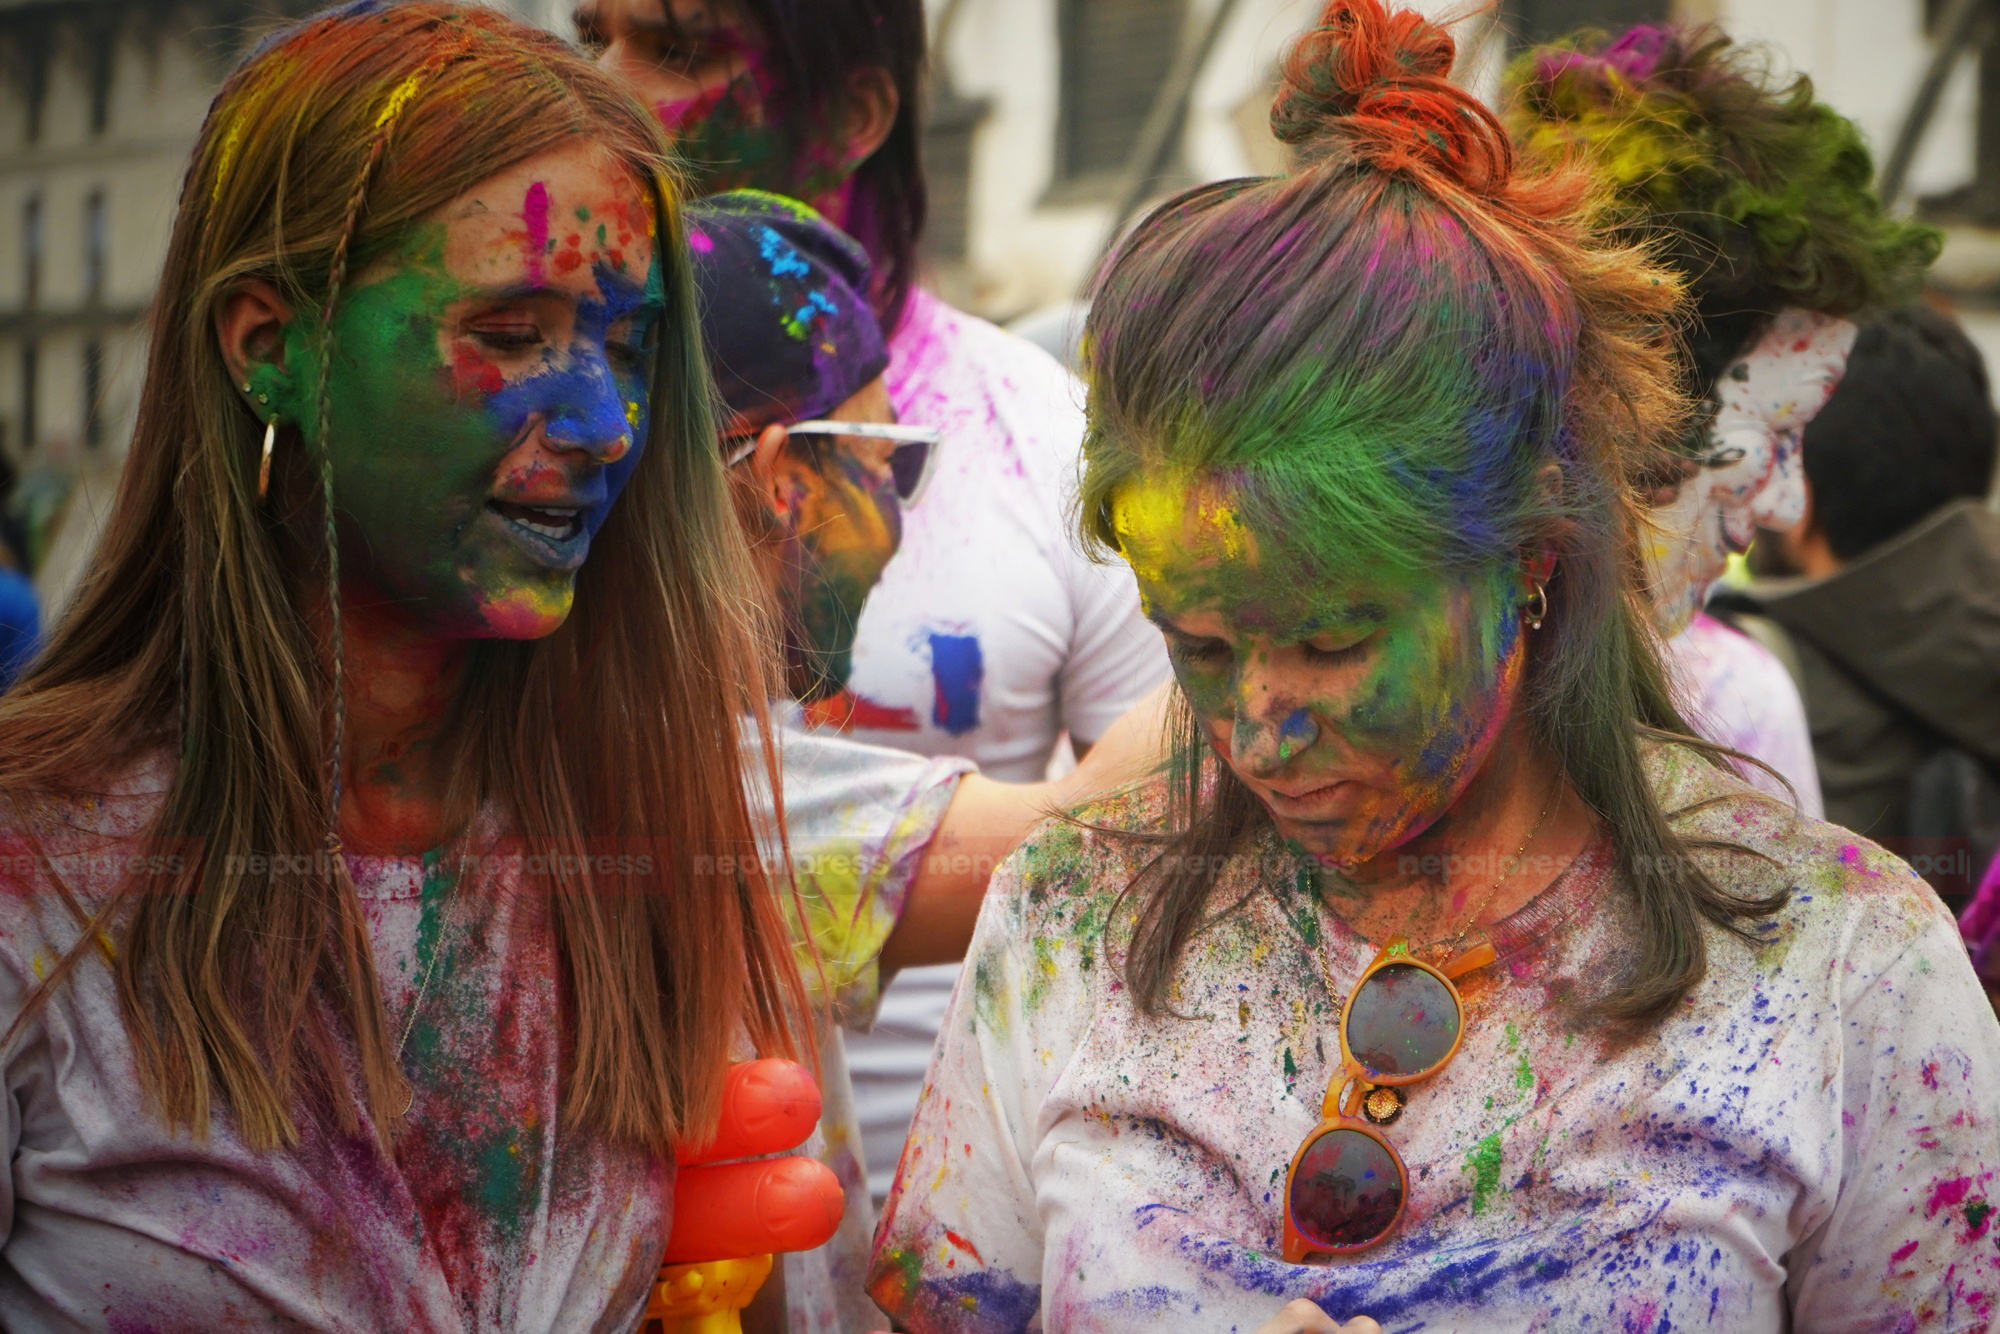 COVID decreases vibrance of Holi celebrations